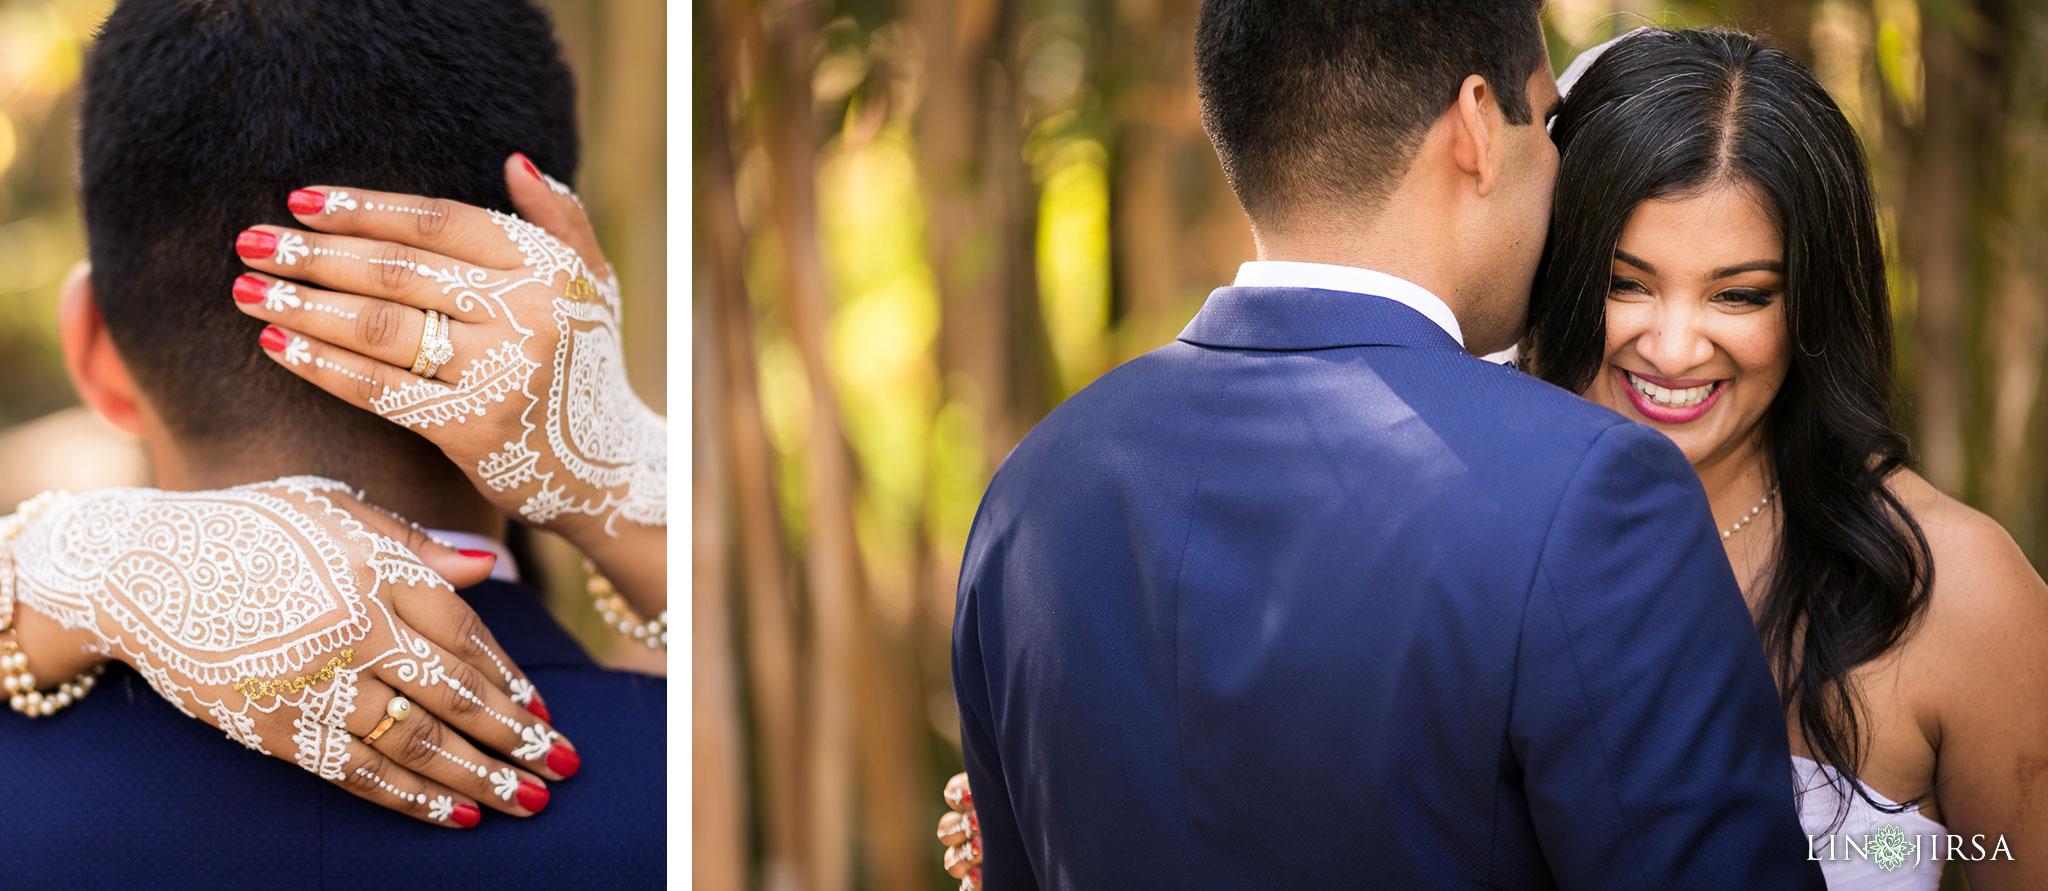 24 Fullerton Arboretum Orange County Wedding Photography